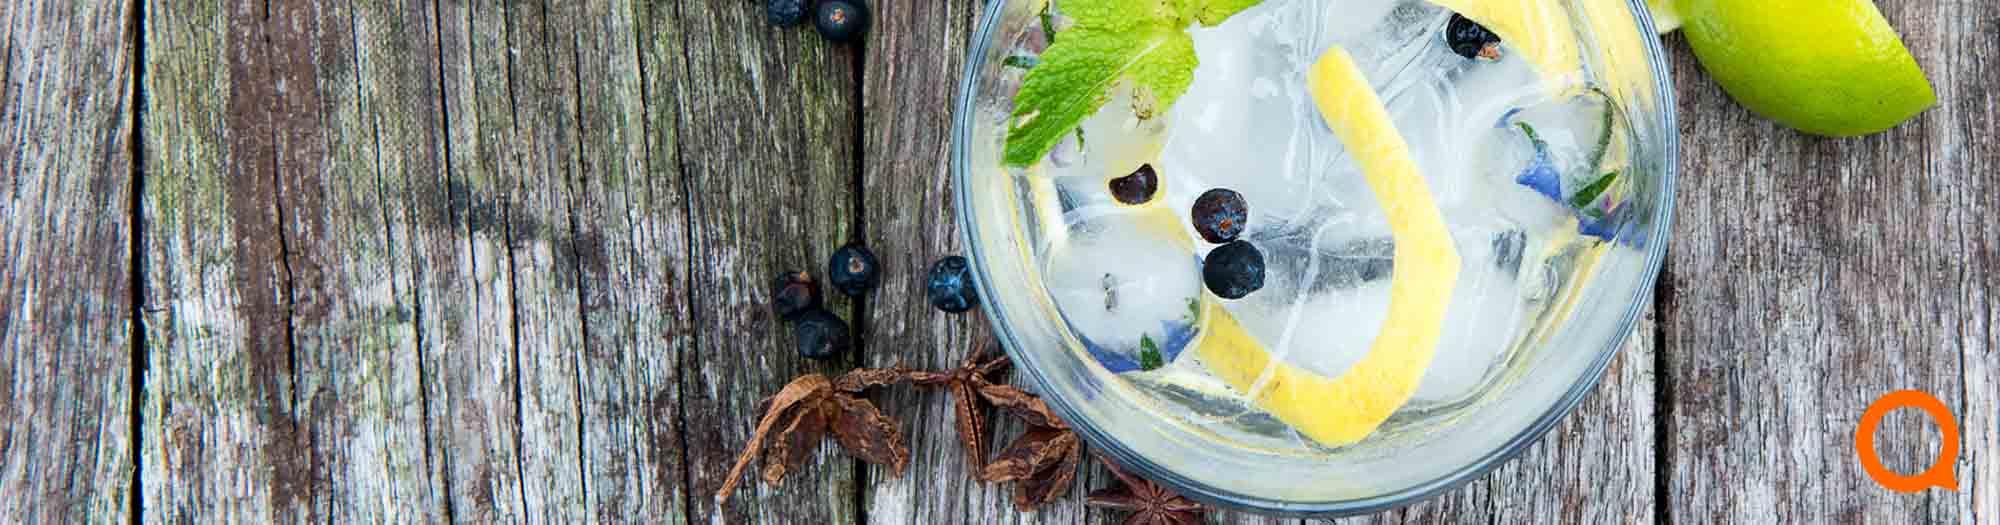 Cocktail dranken